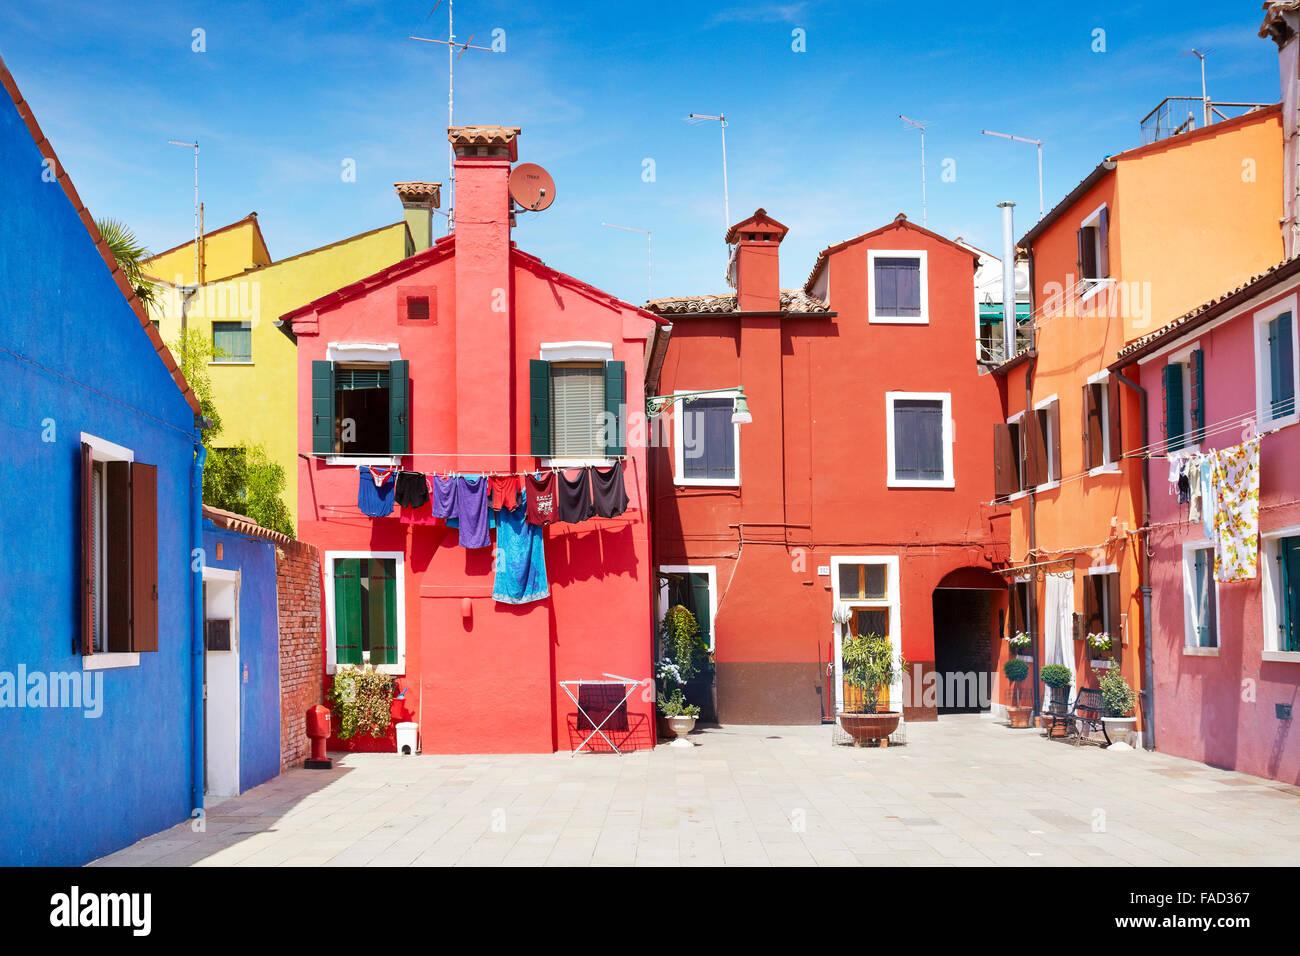 Characteristic colourful houses in village of Burano near Venice in Italy (Burano Lagoon Island), UNESCO - Stock Image